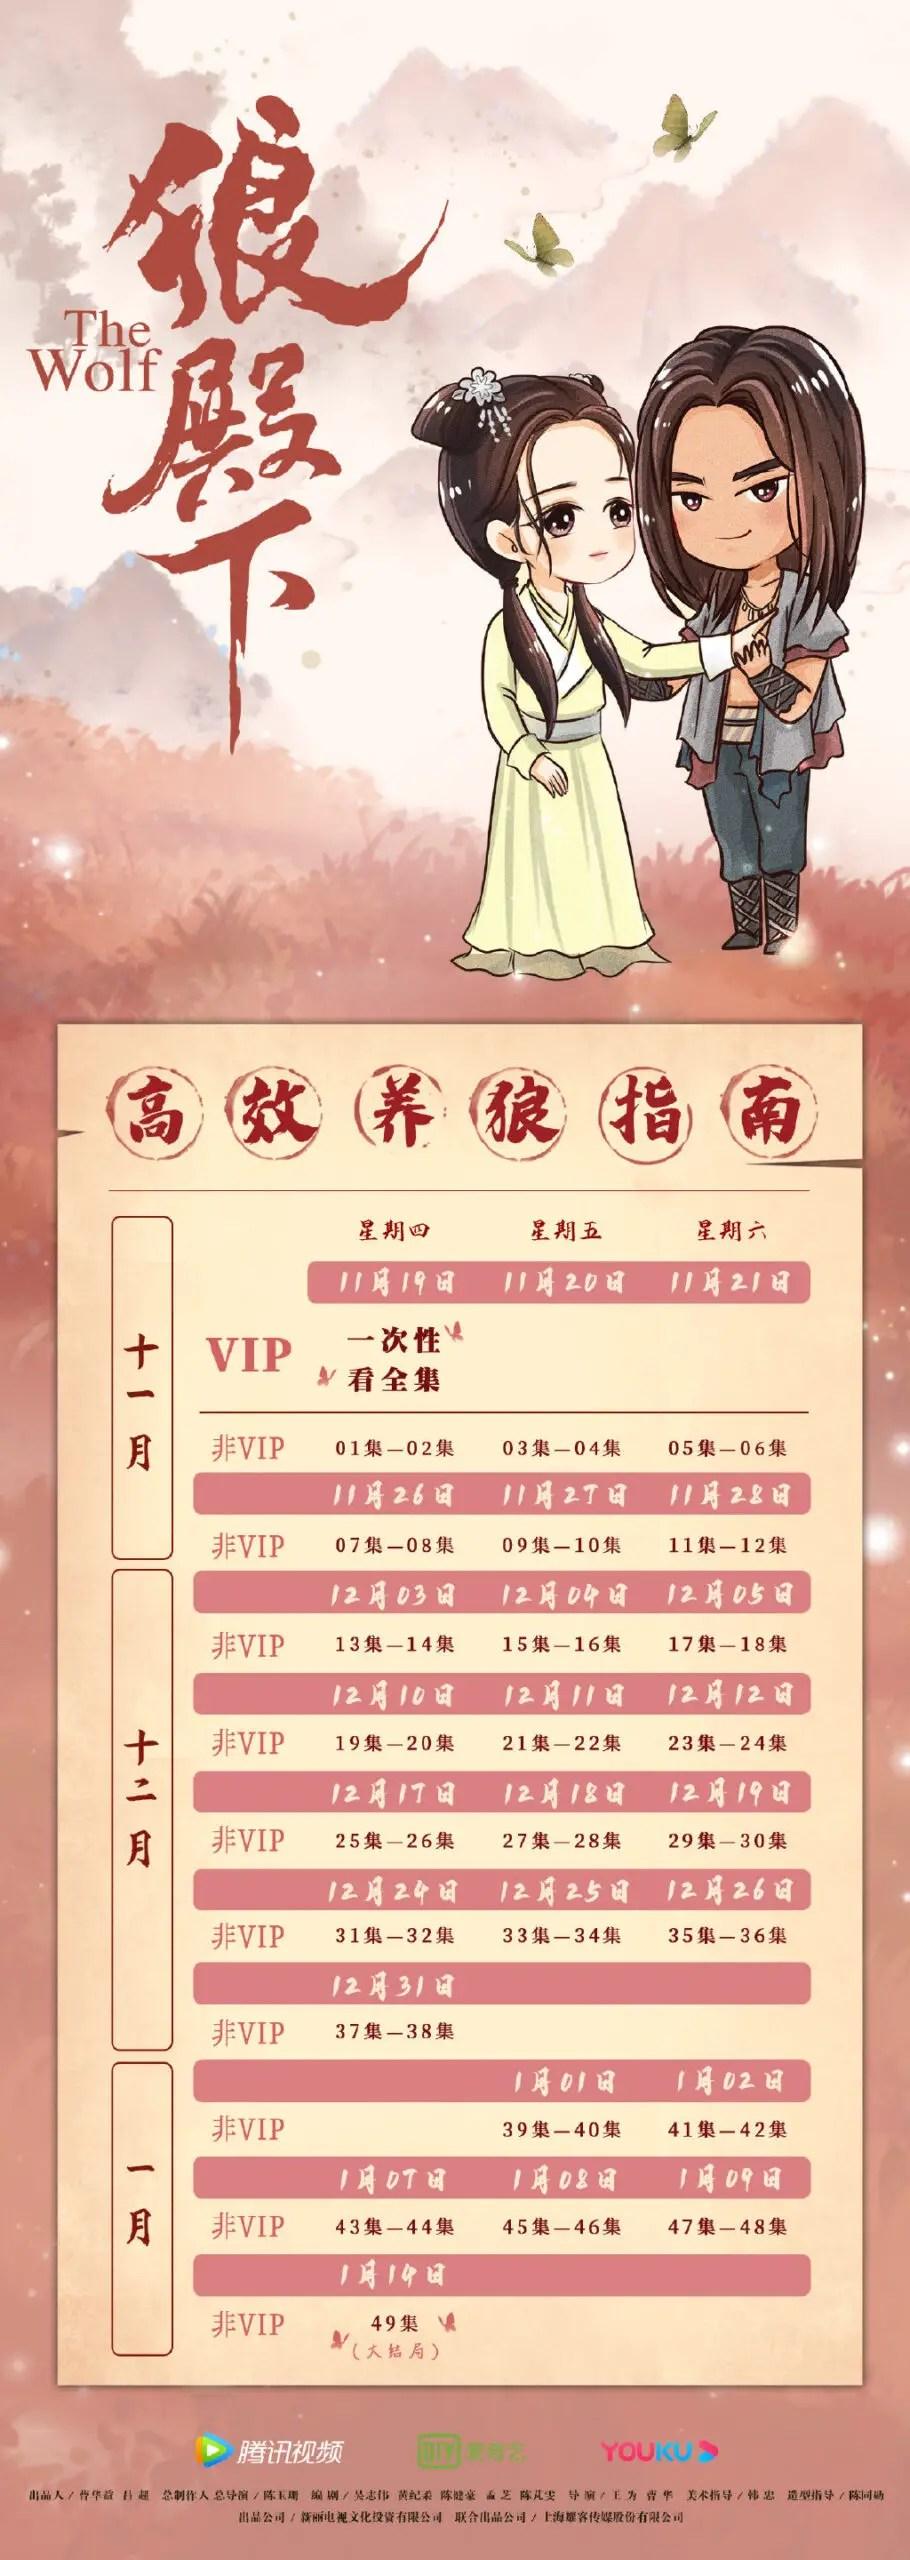 The Wolf Chinese Drama Airing Calendar